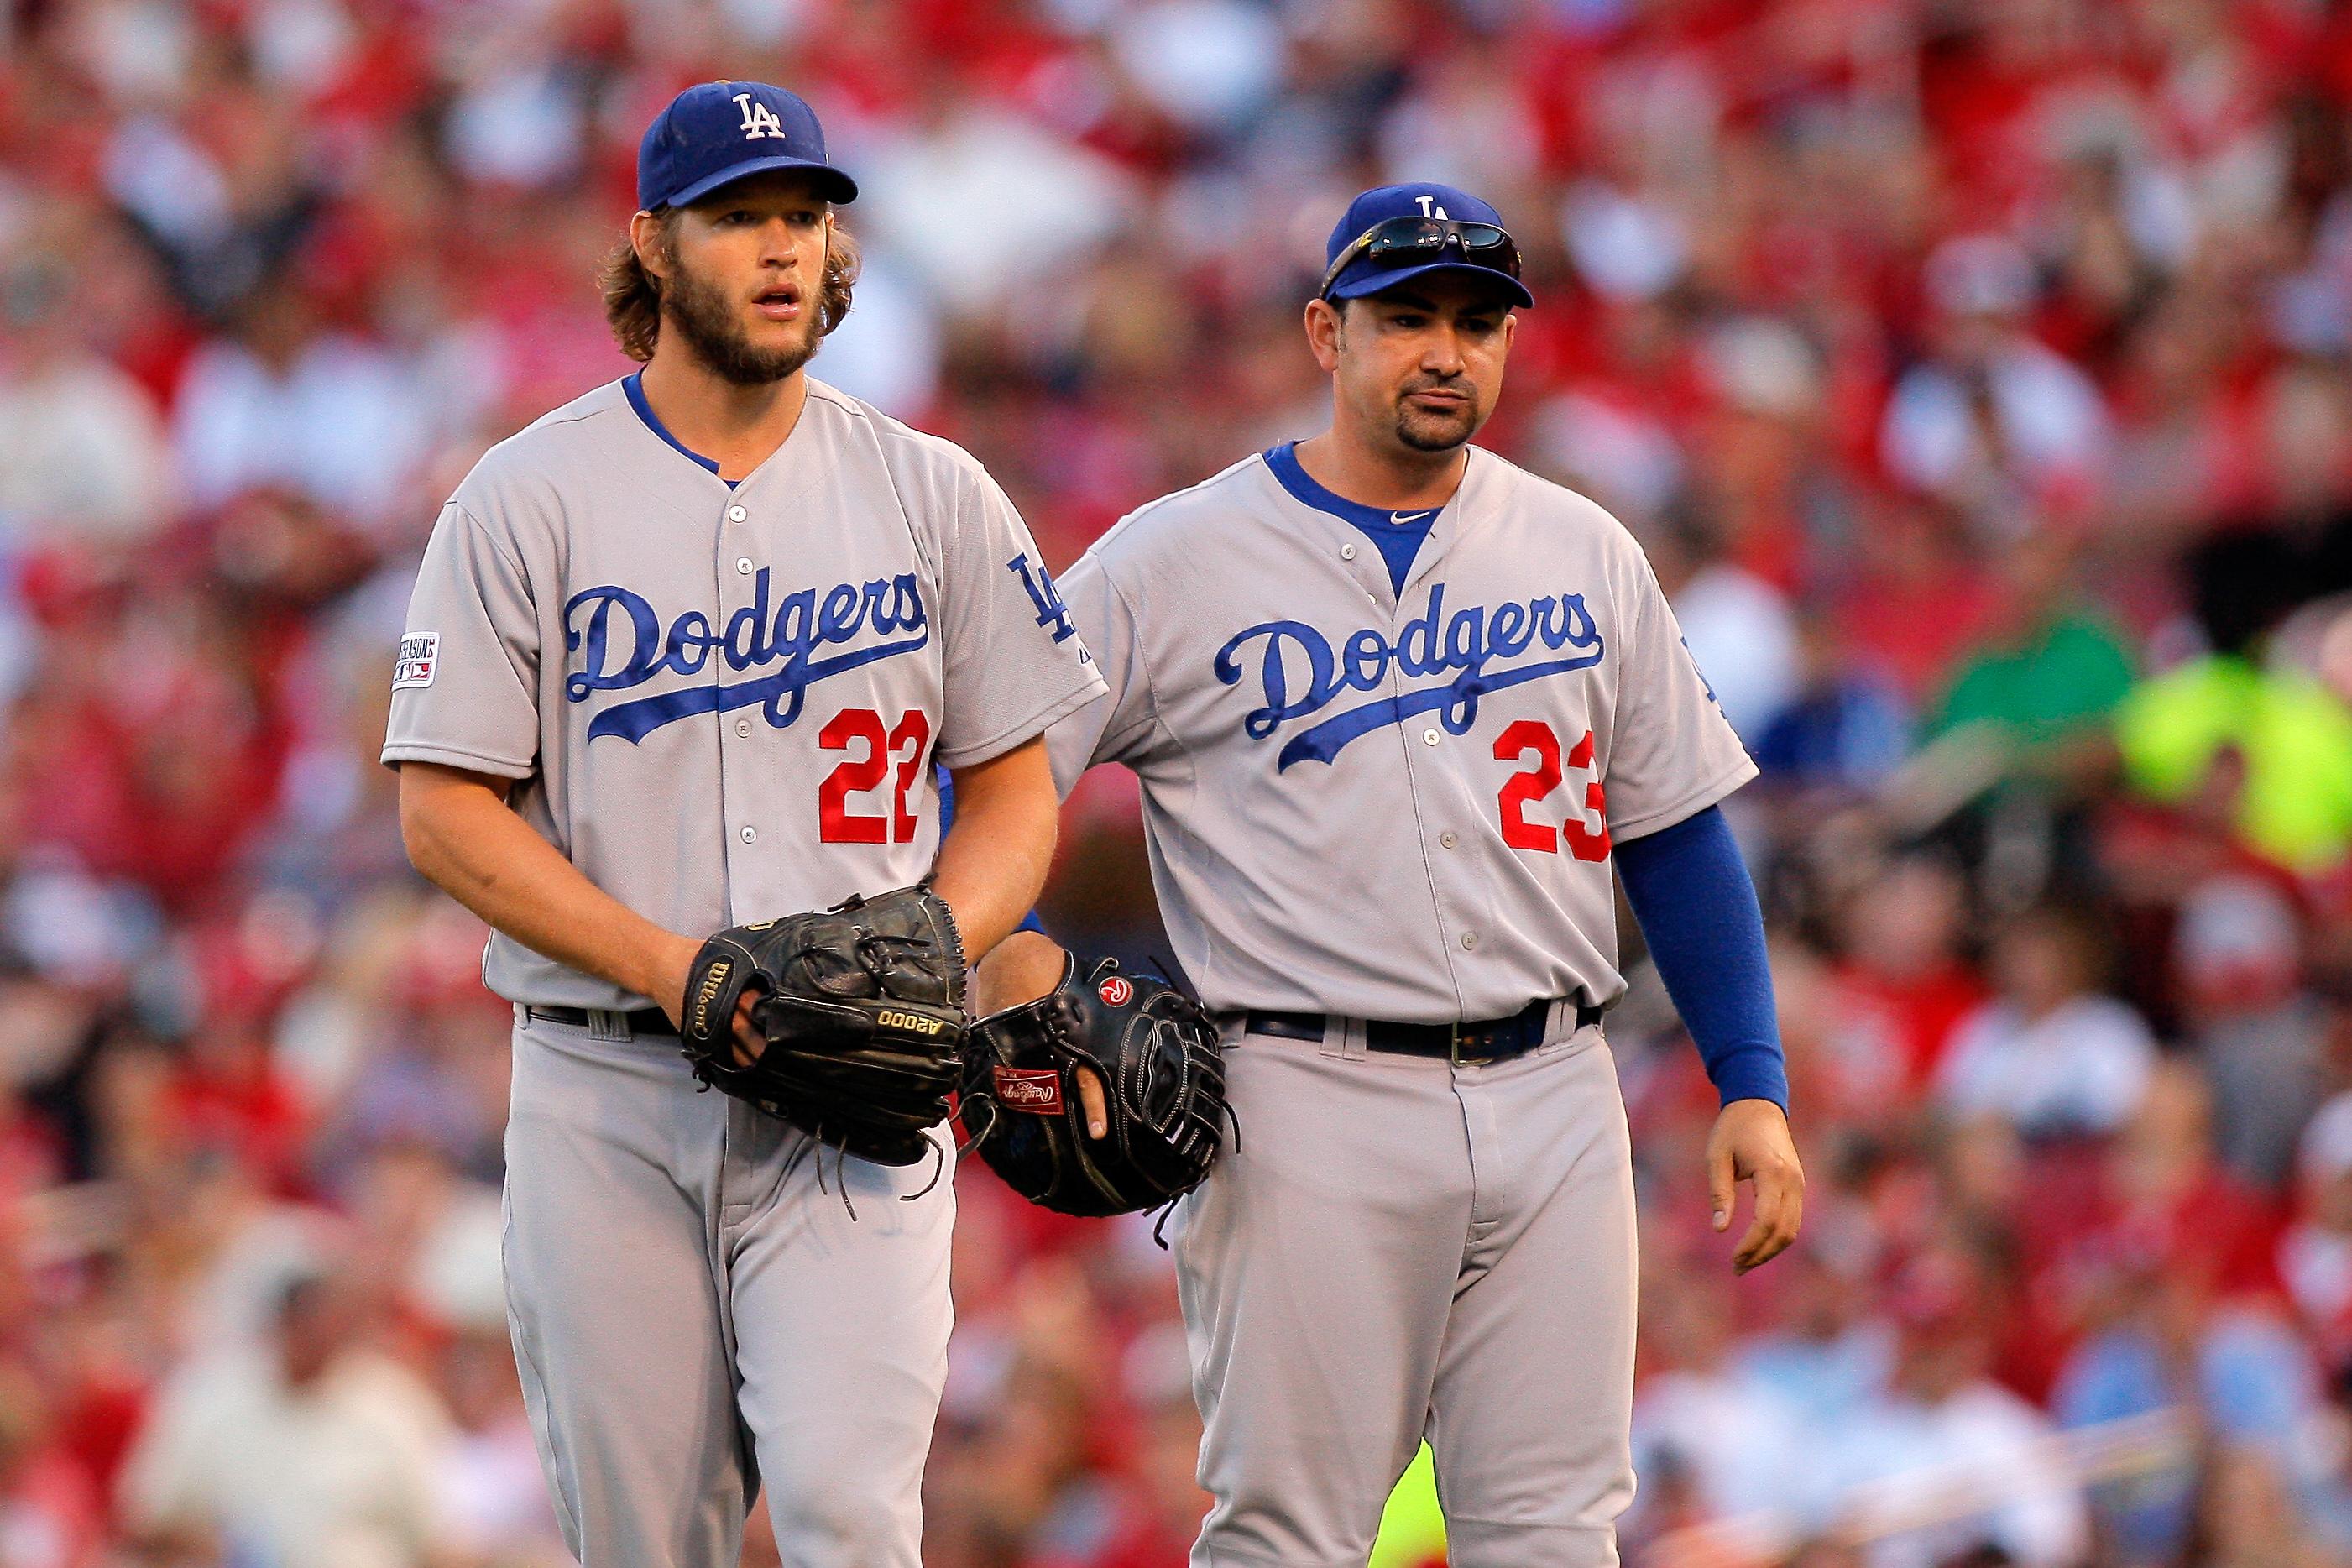 MLB: OCT 07 NLDS - Dodgers at Cardinals - Game 4